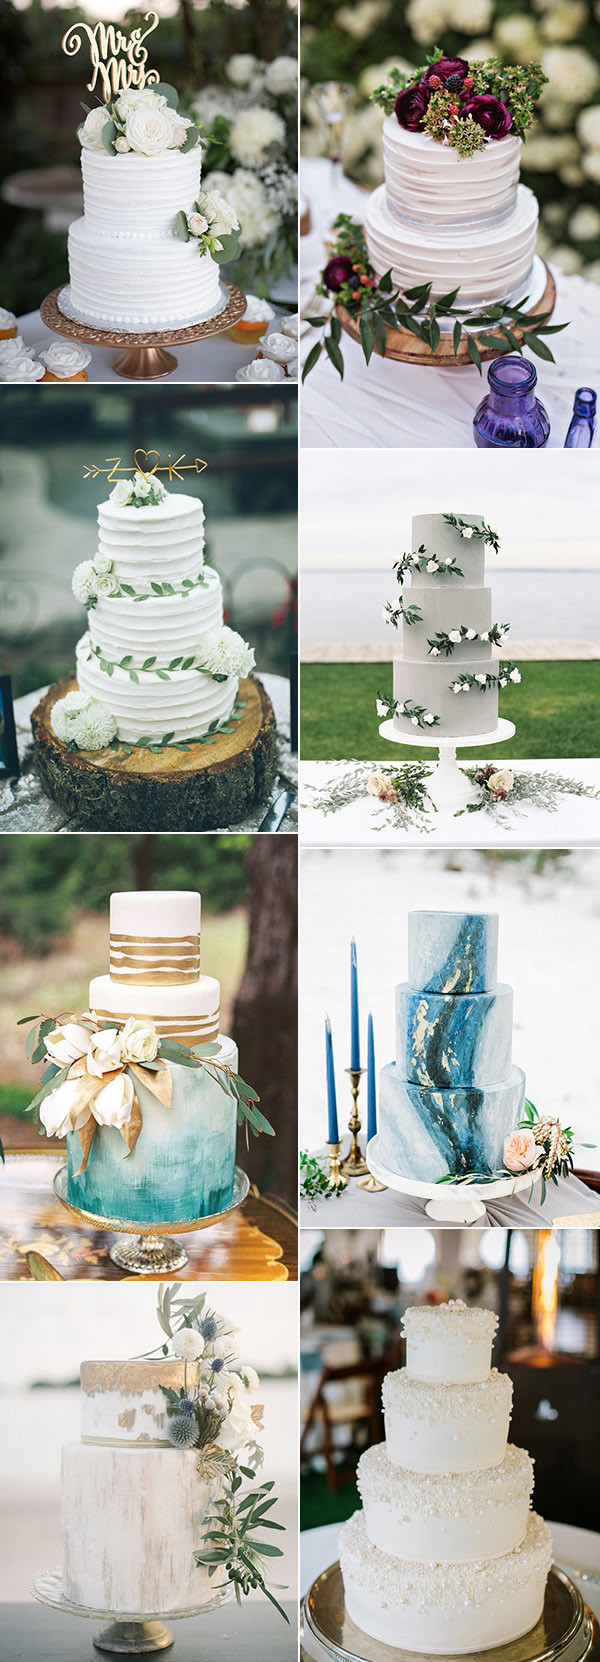 2017 trending stunning wedding cakes for wedding ideas